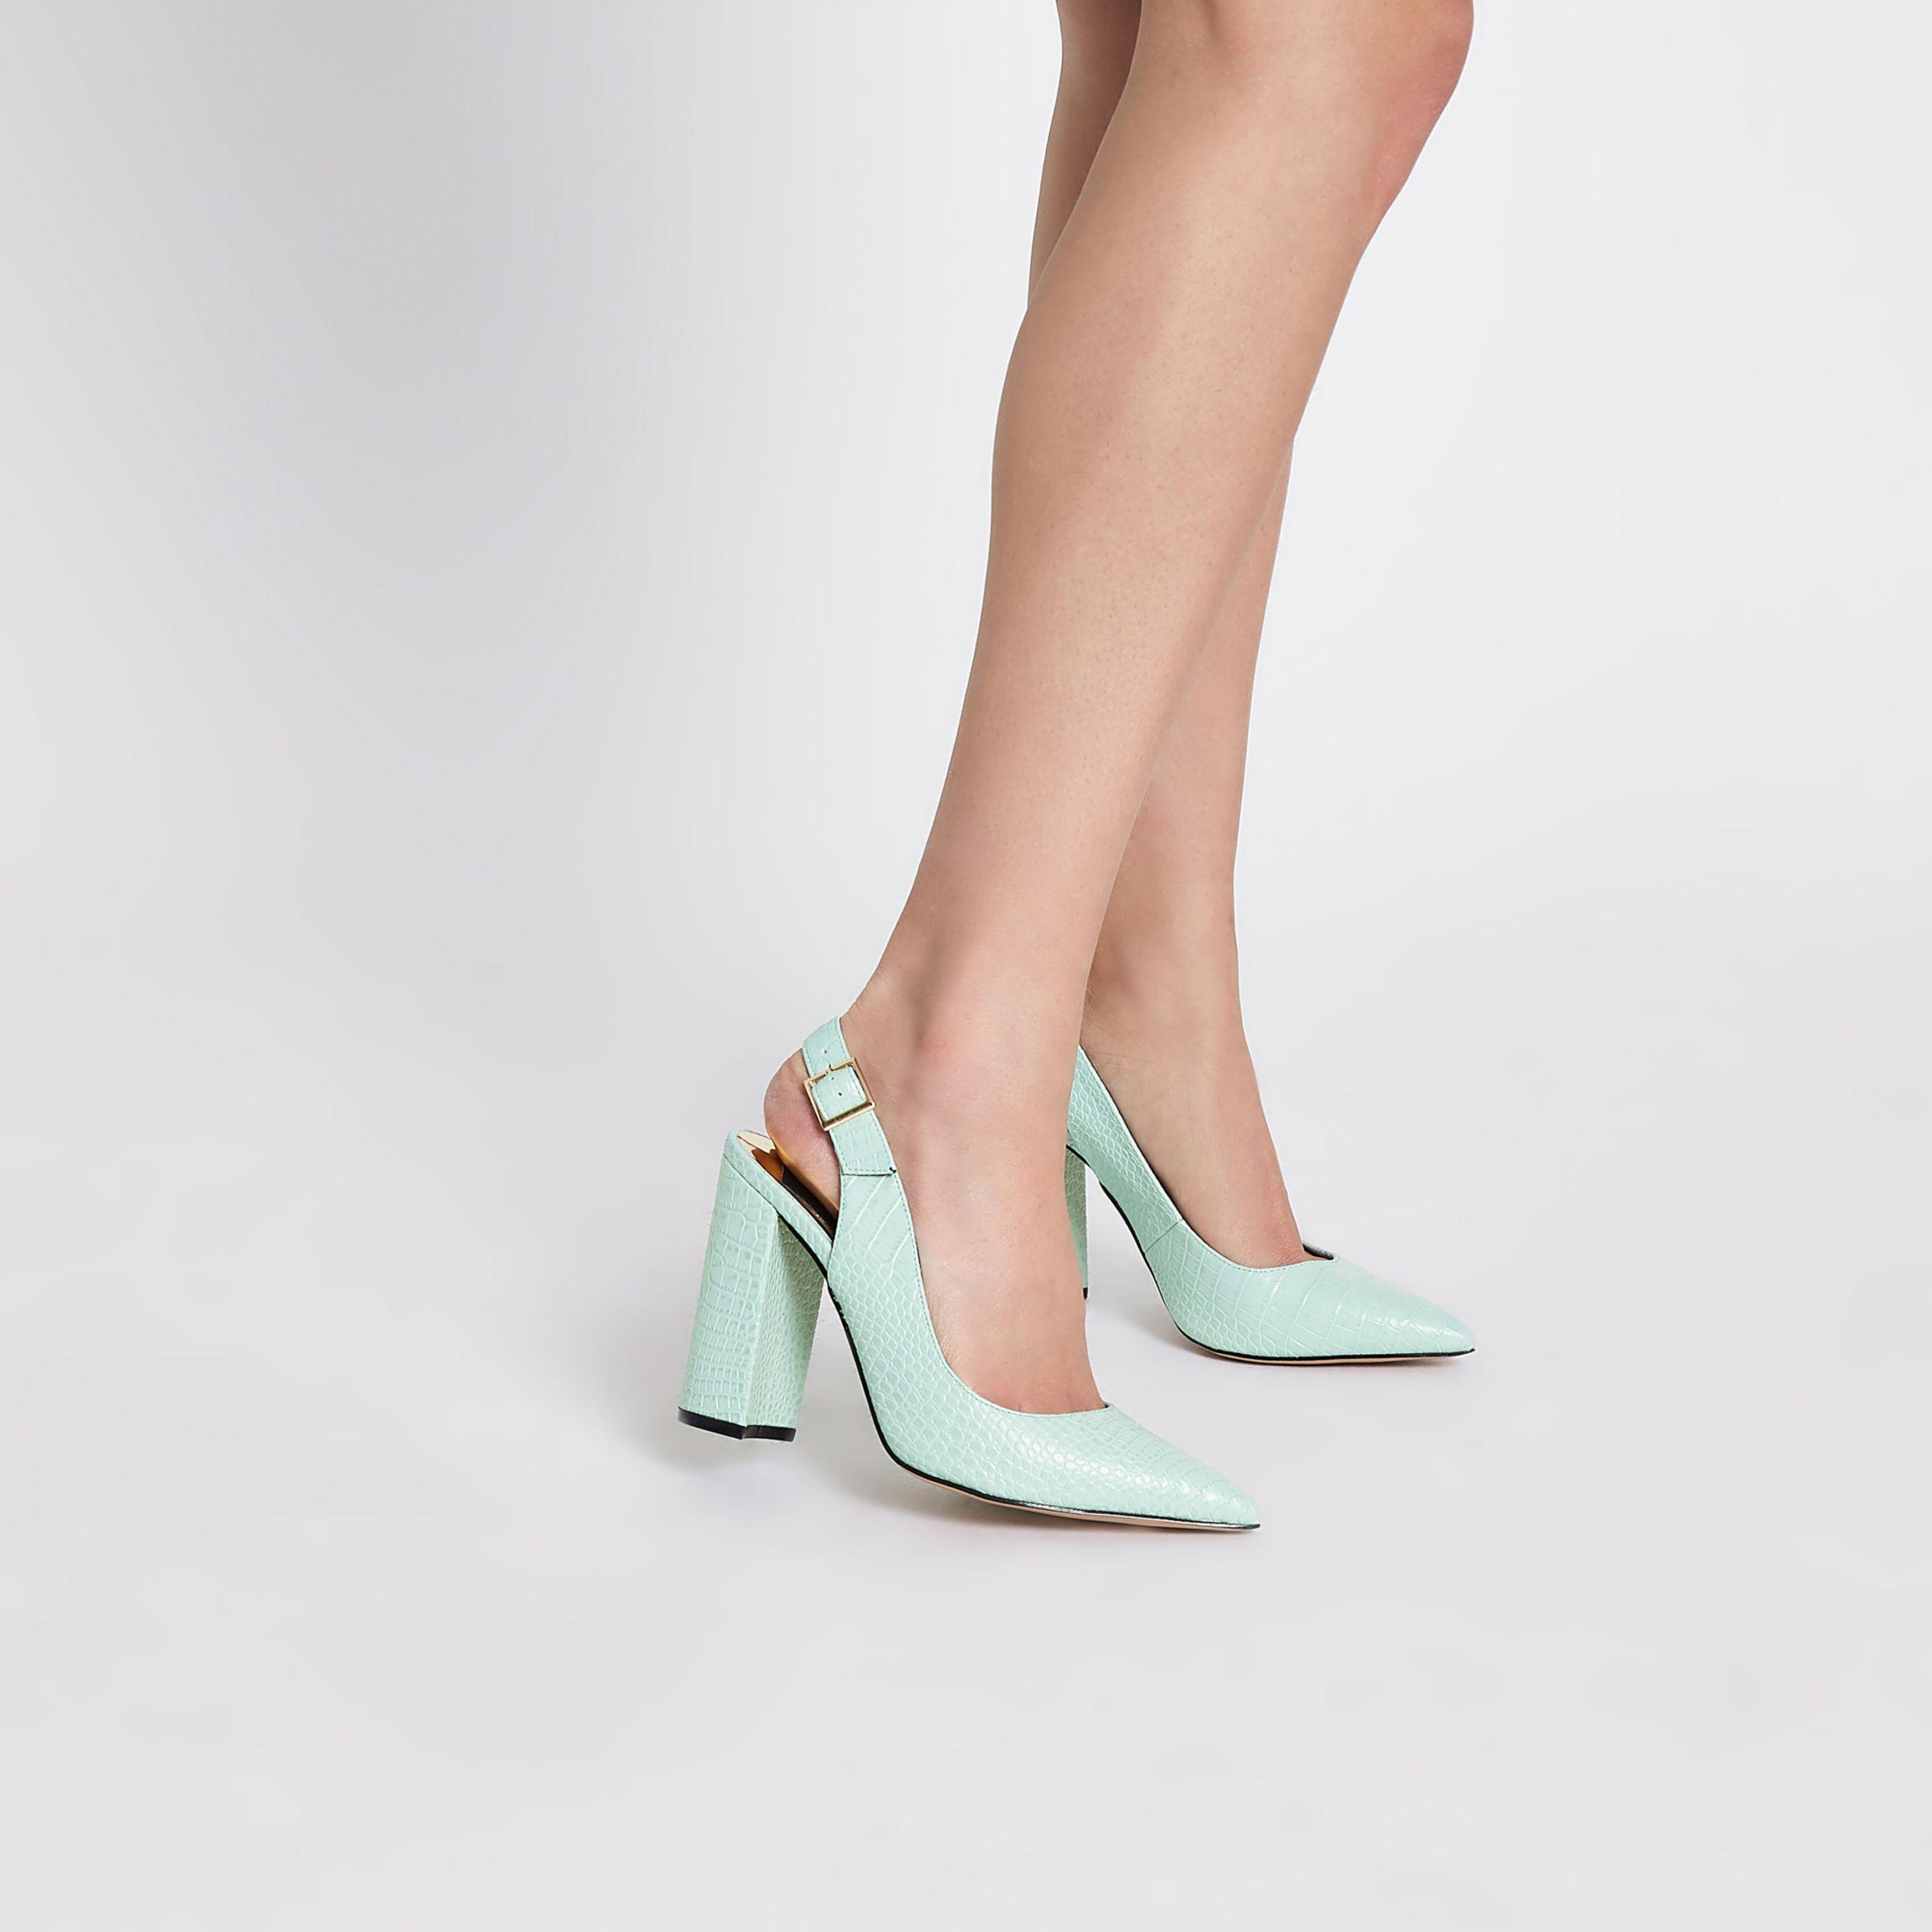 87d2b69d417 River Island Croc Block Heel Sling Back Court Shoes in Green - Lyst